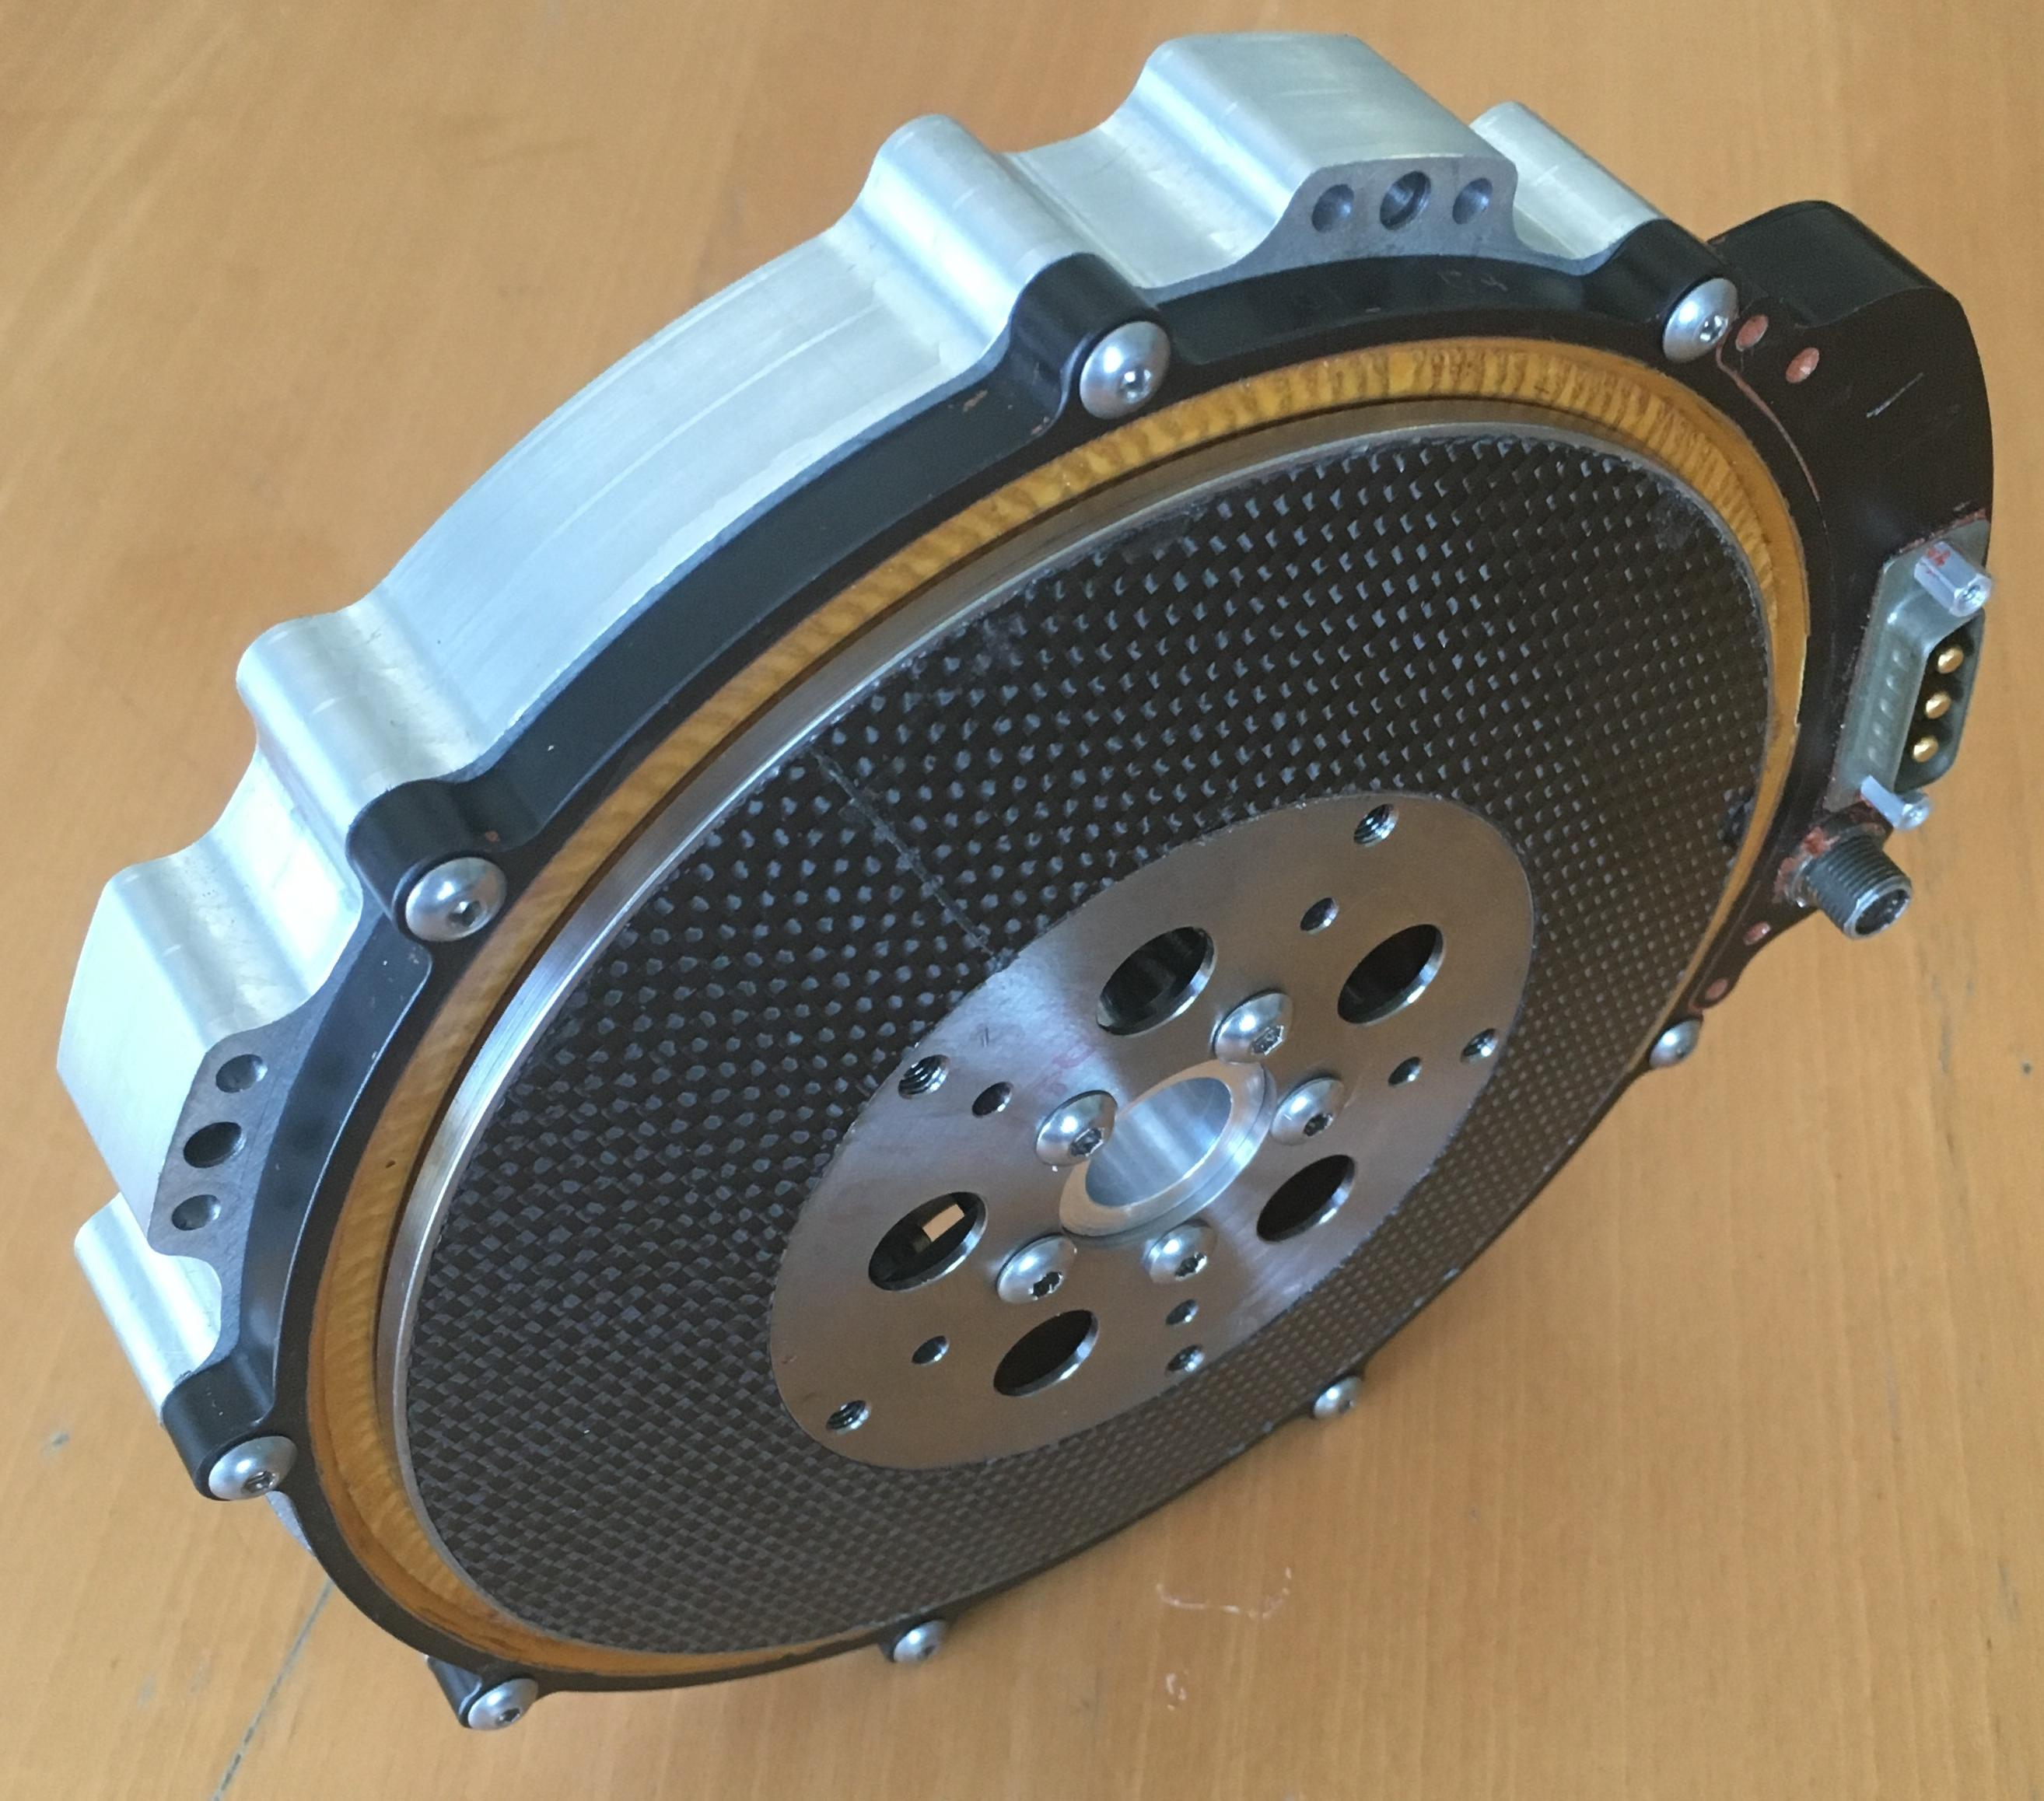 demo 6kw motor in housing 5.jpg